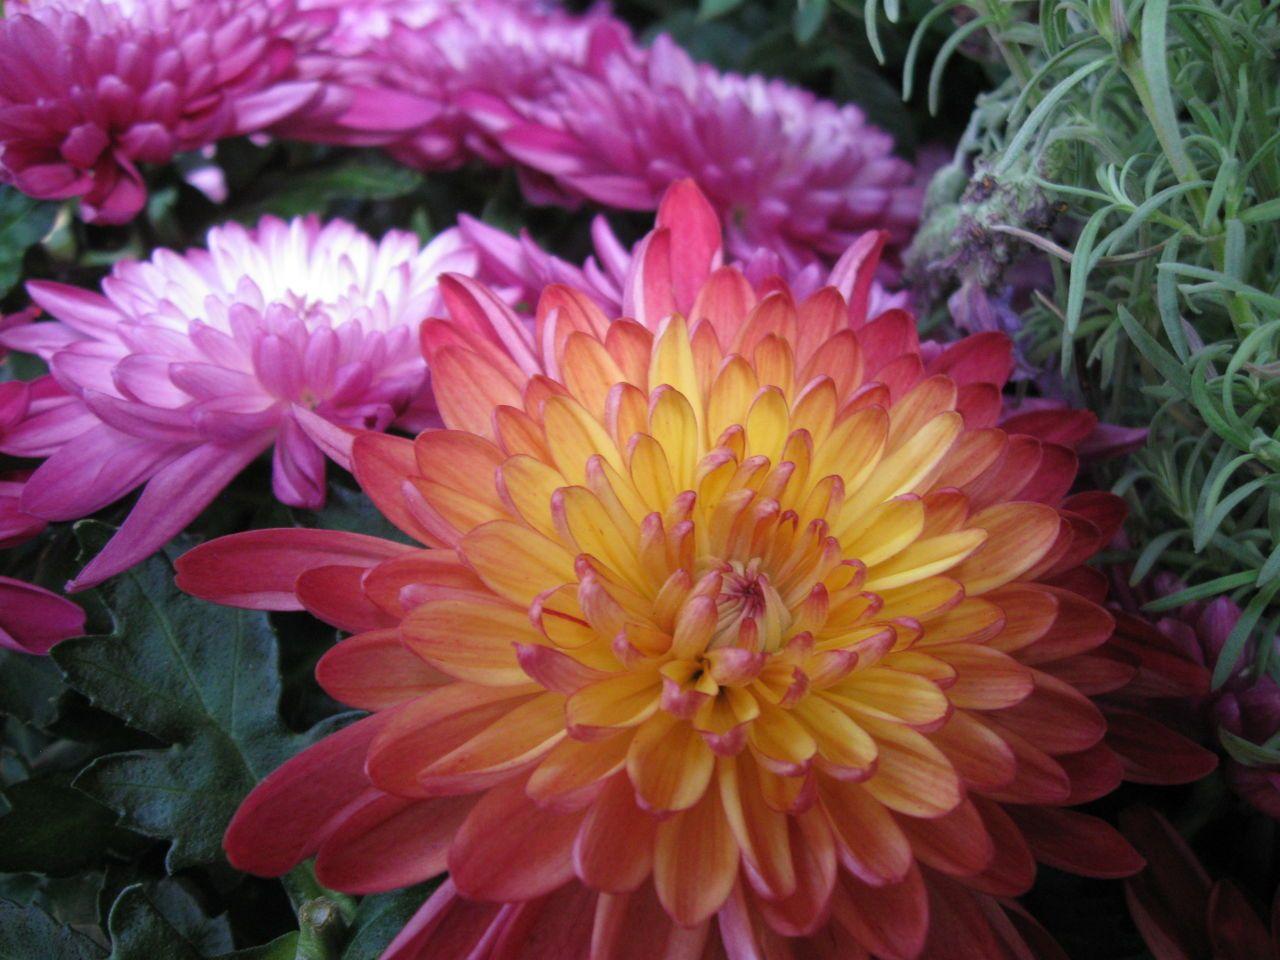 Chrysanthemum Flower Chrysanthemum Chrysanthemum Flower Crysanthemum Flower